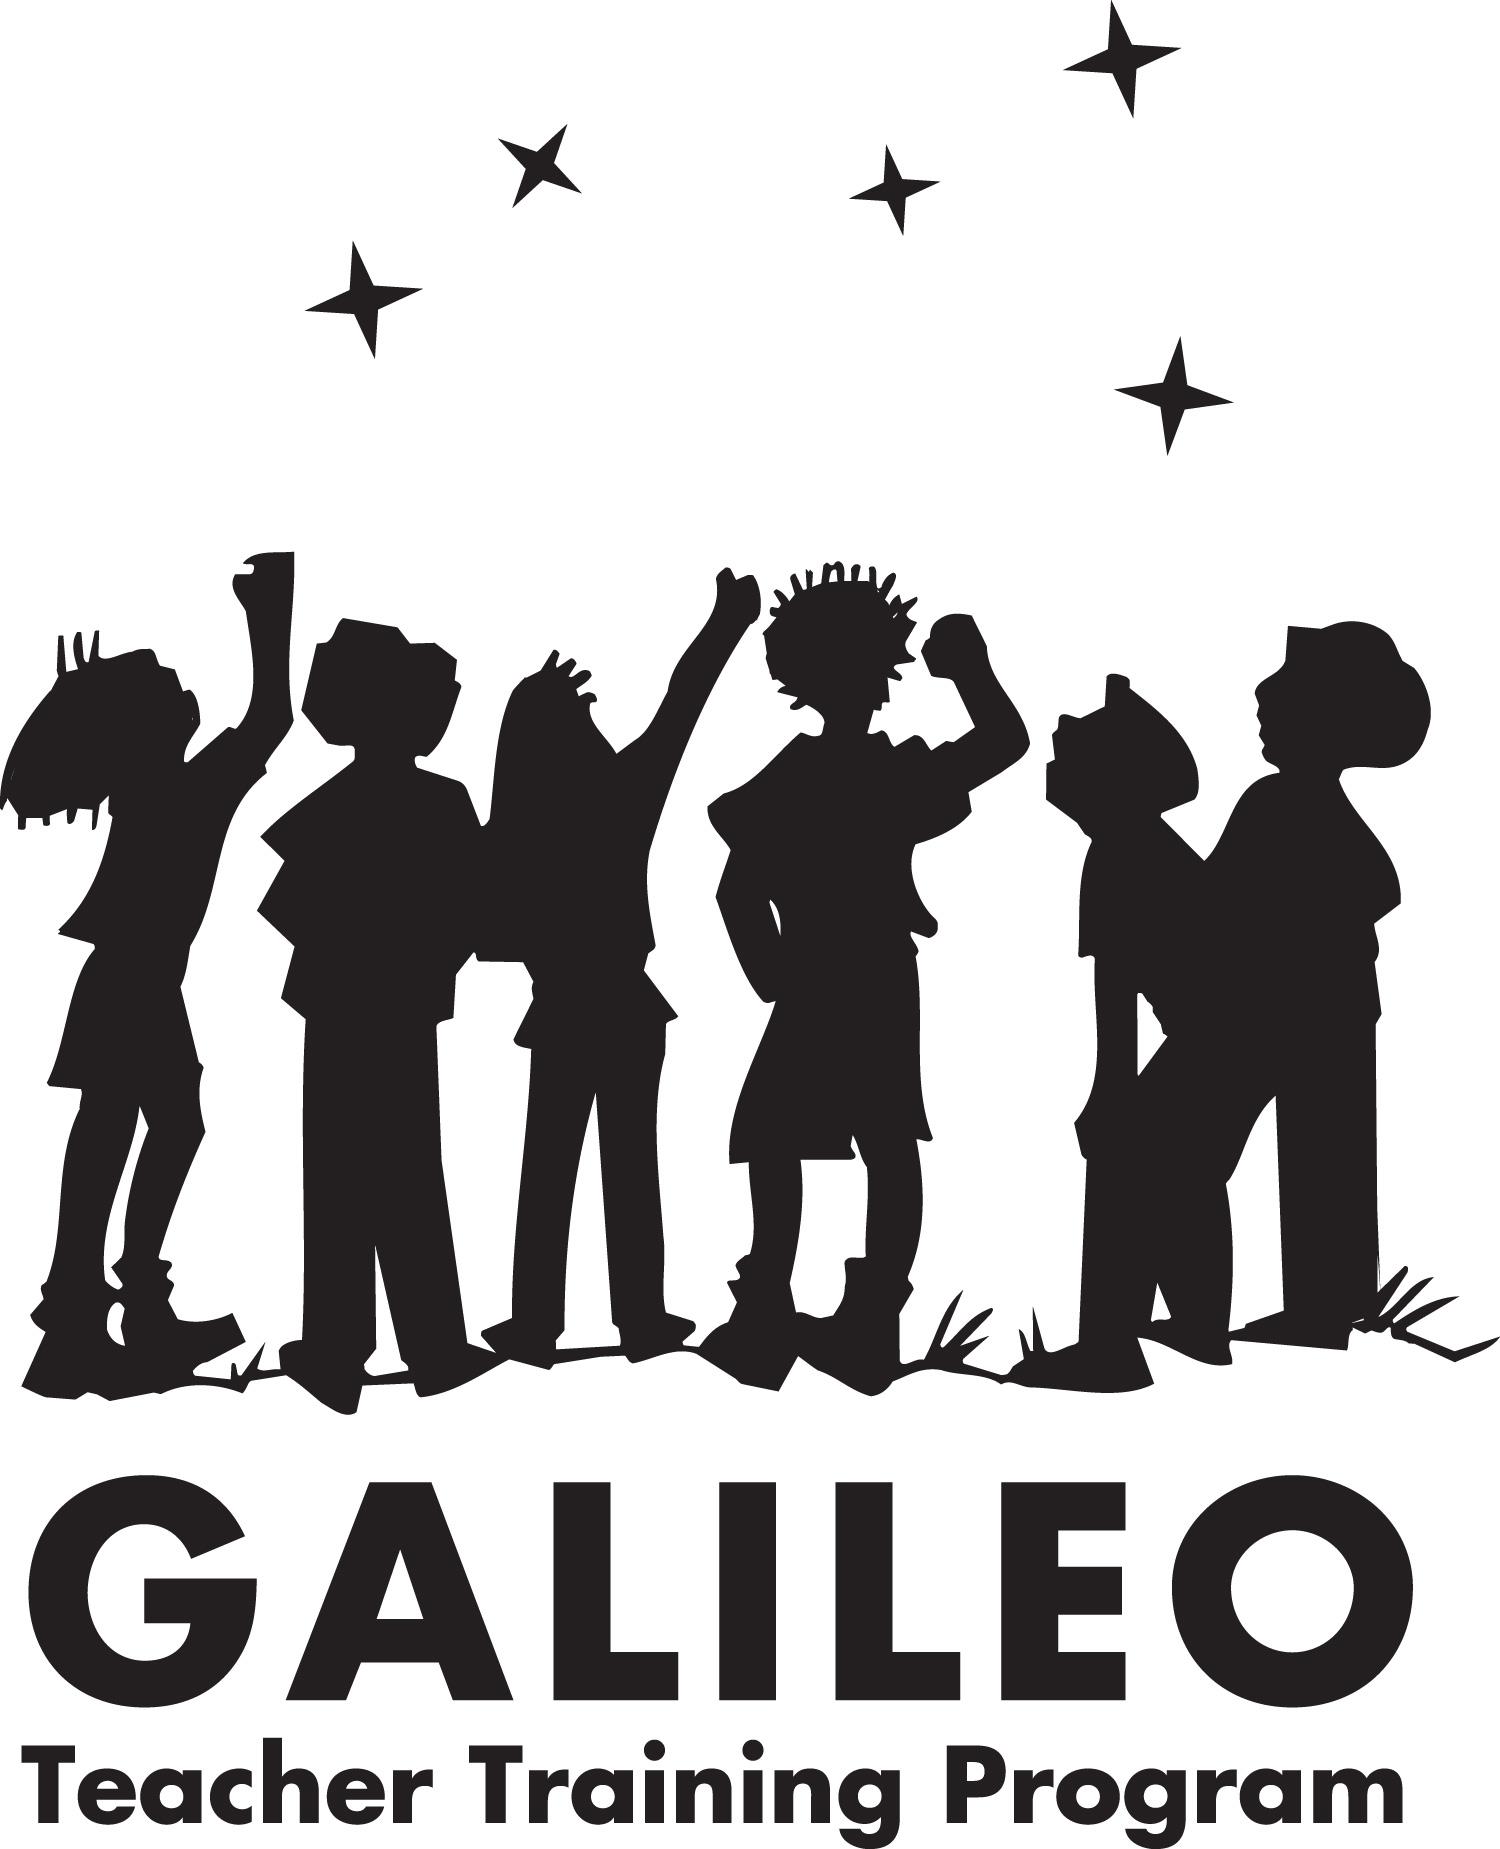 Galileo_Teacher_Training_Program.jpg